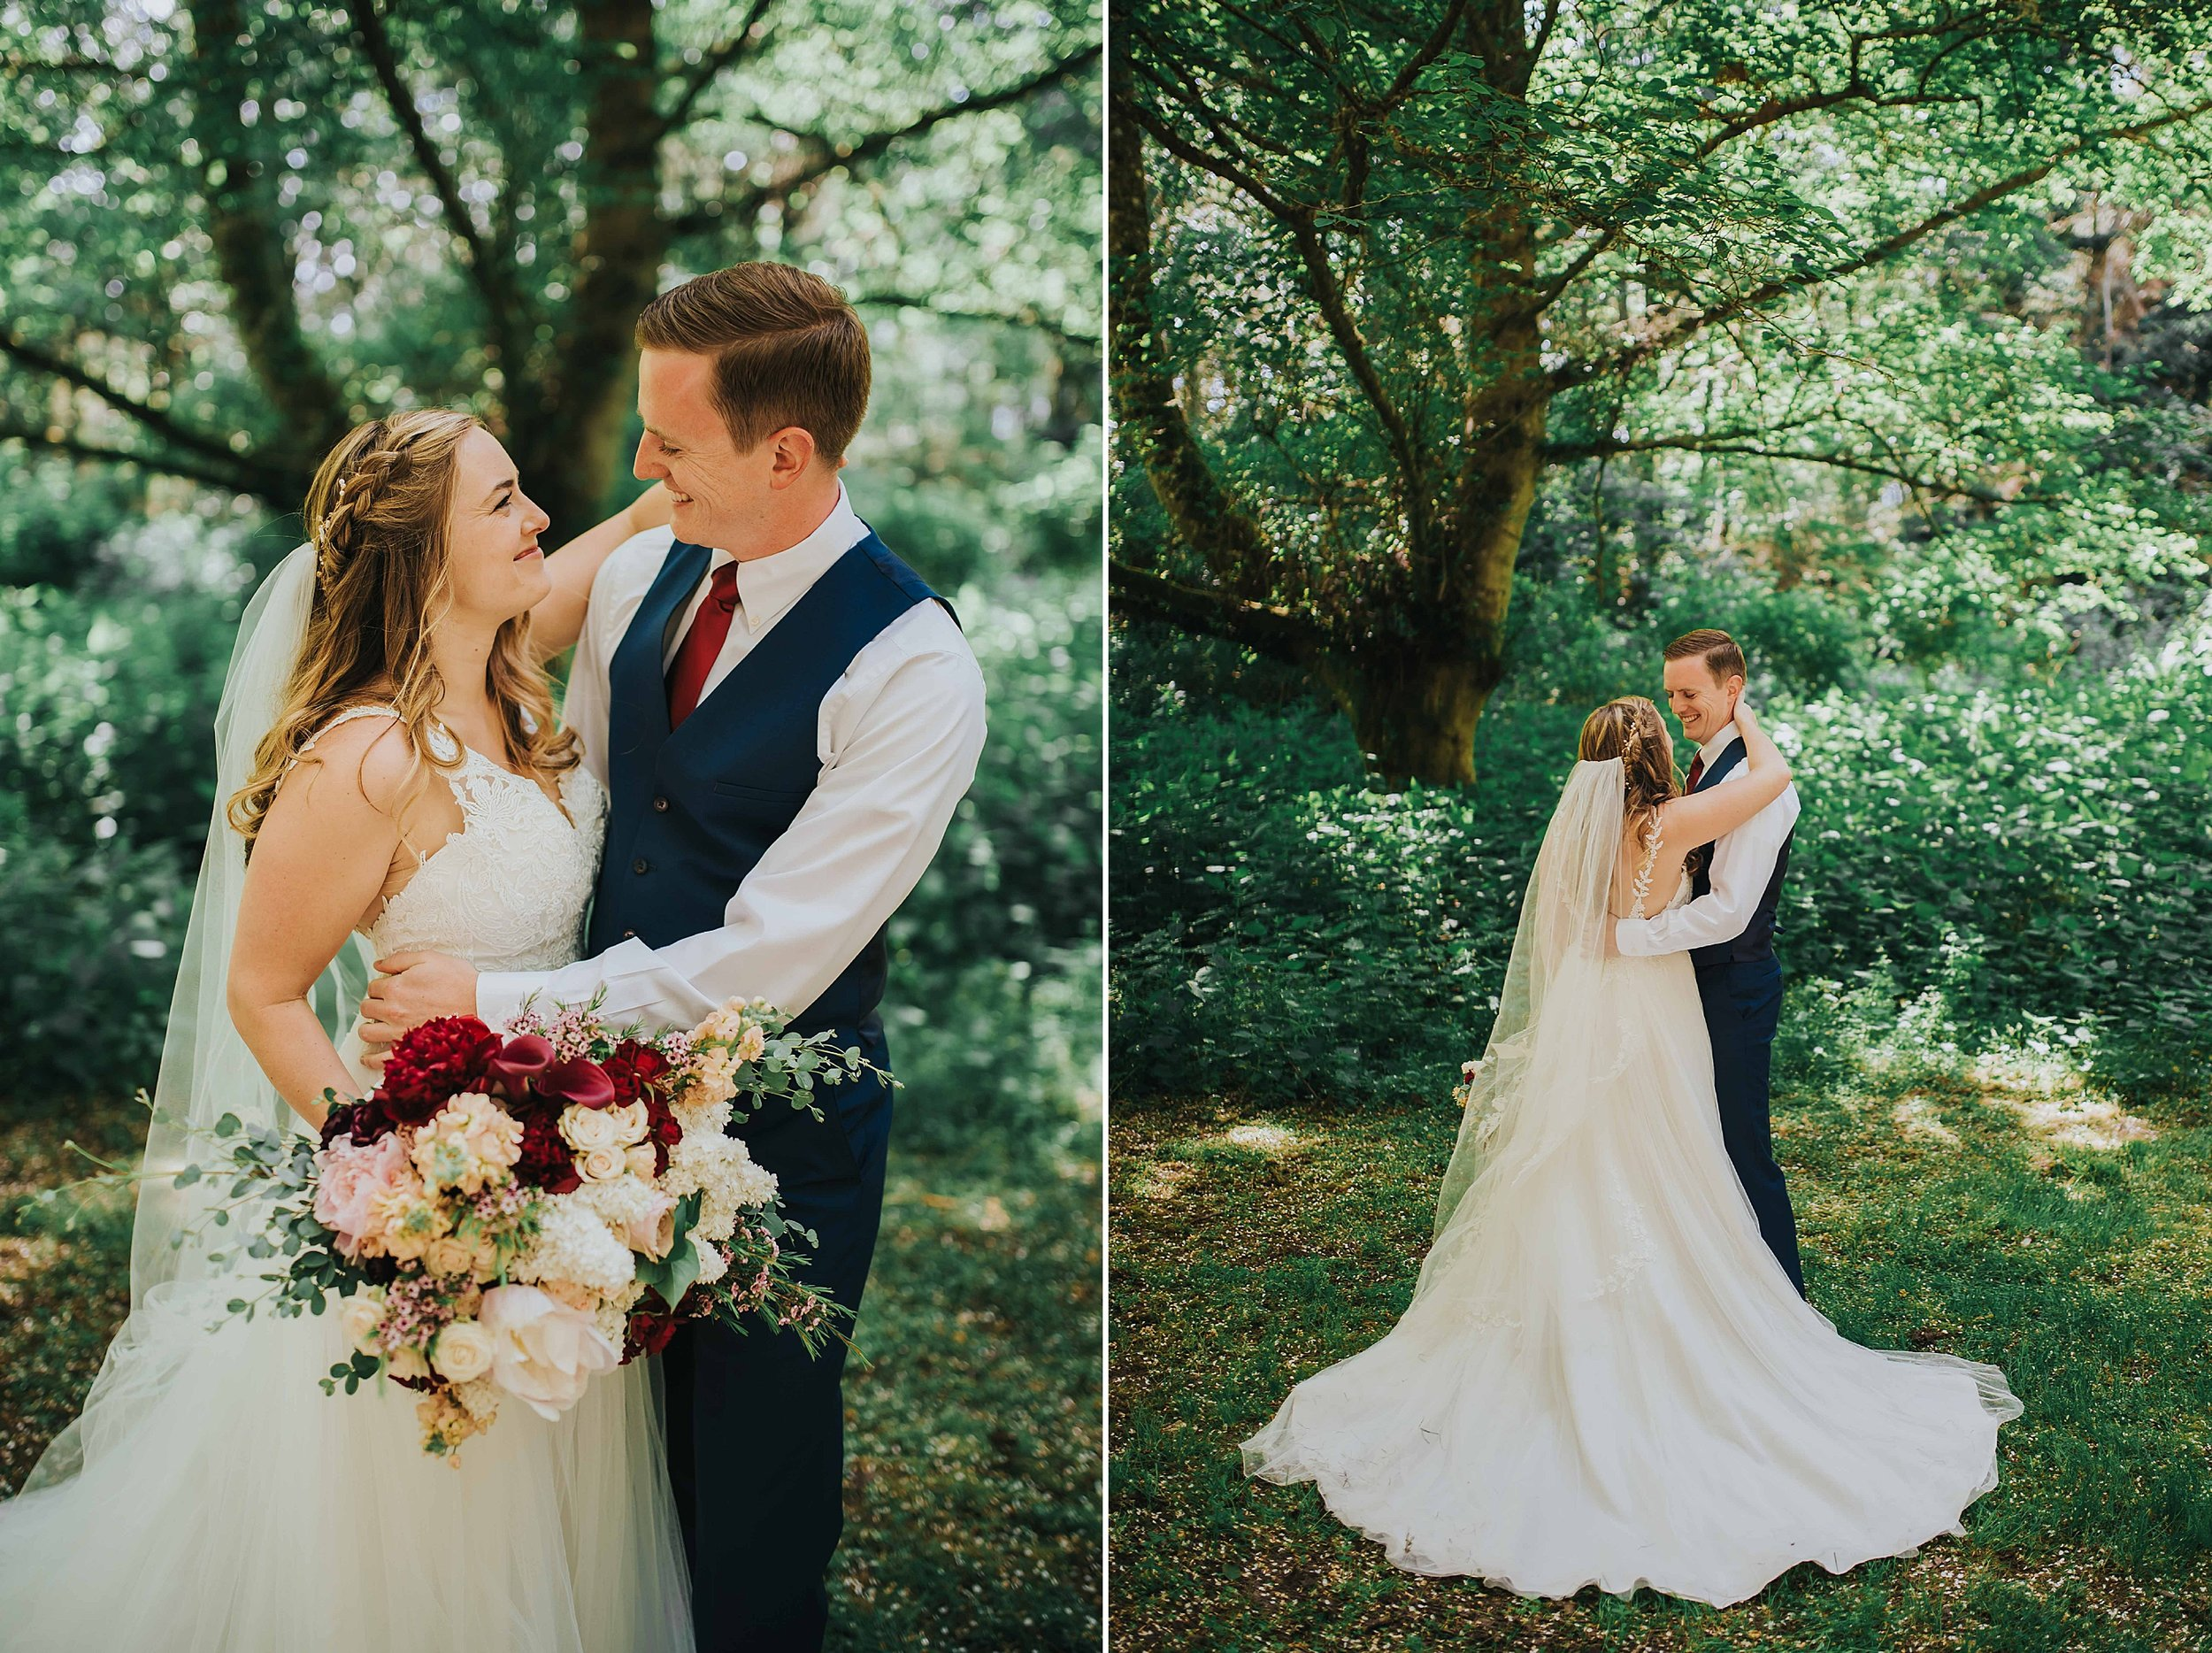 Crockett Farm-Wedding-photographer-J HODGES PHOTOGRAPHY_0291.jpg